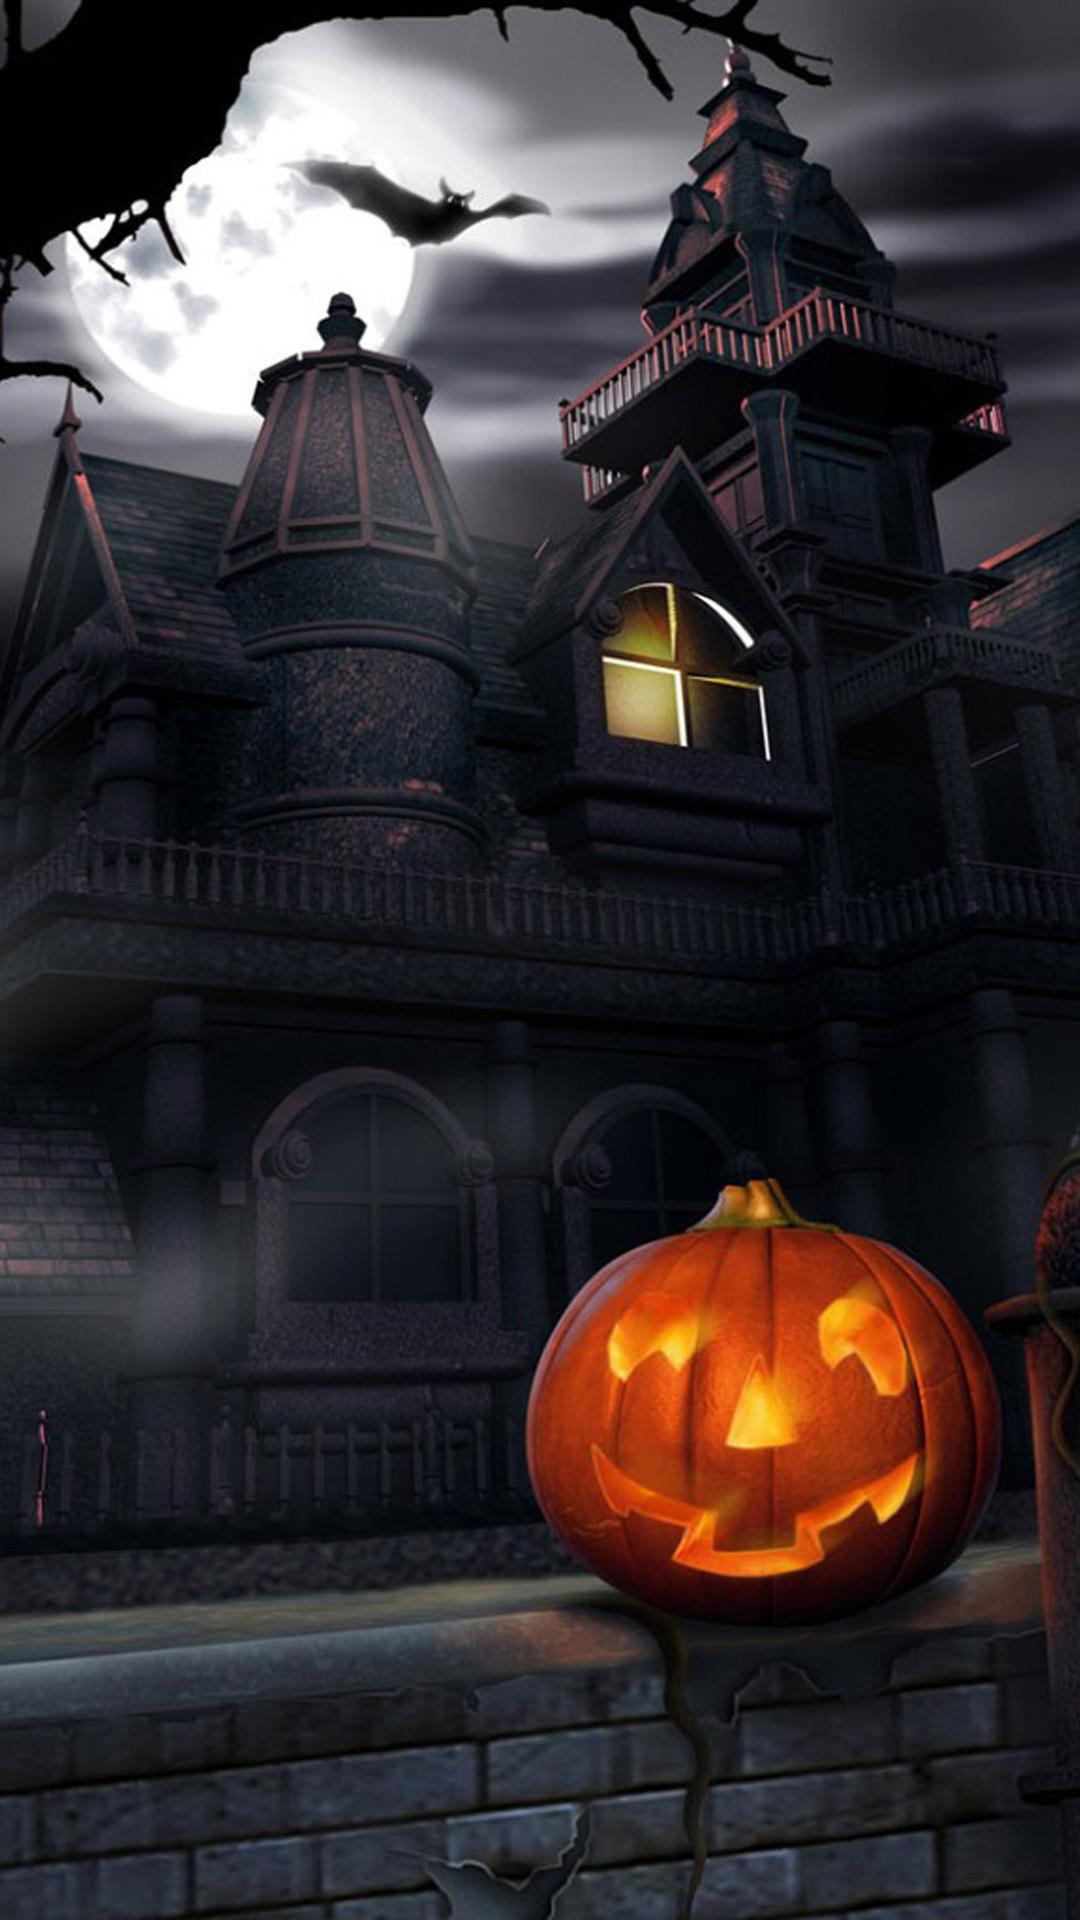 72 Live Halloween Wallpaper For Iphone